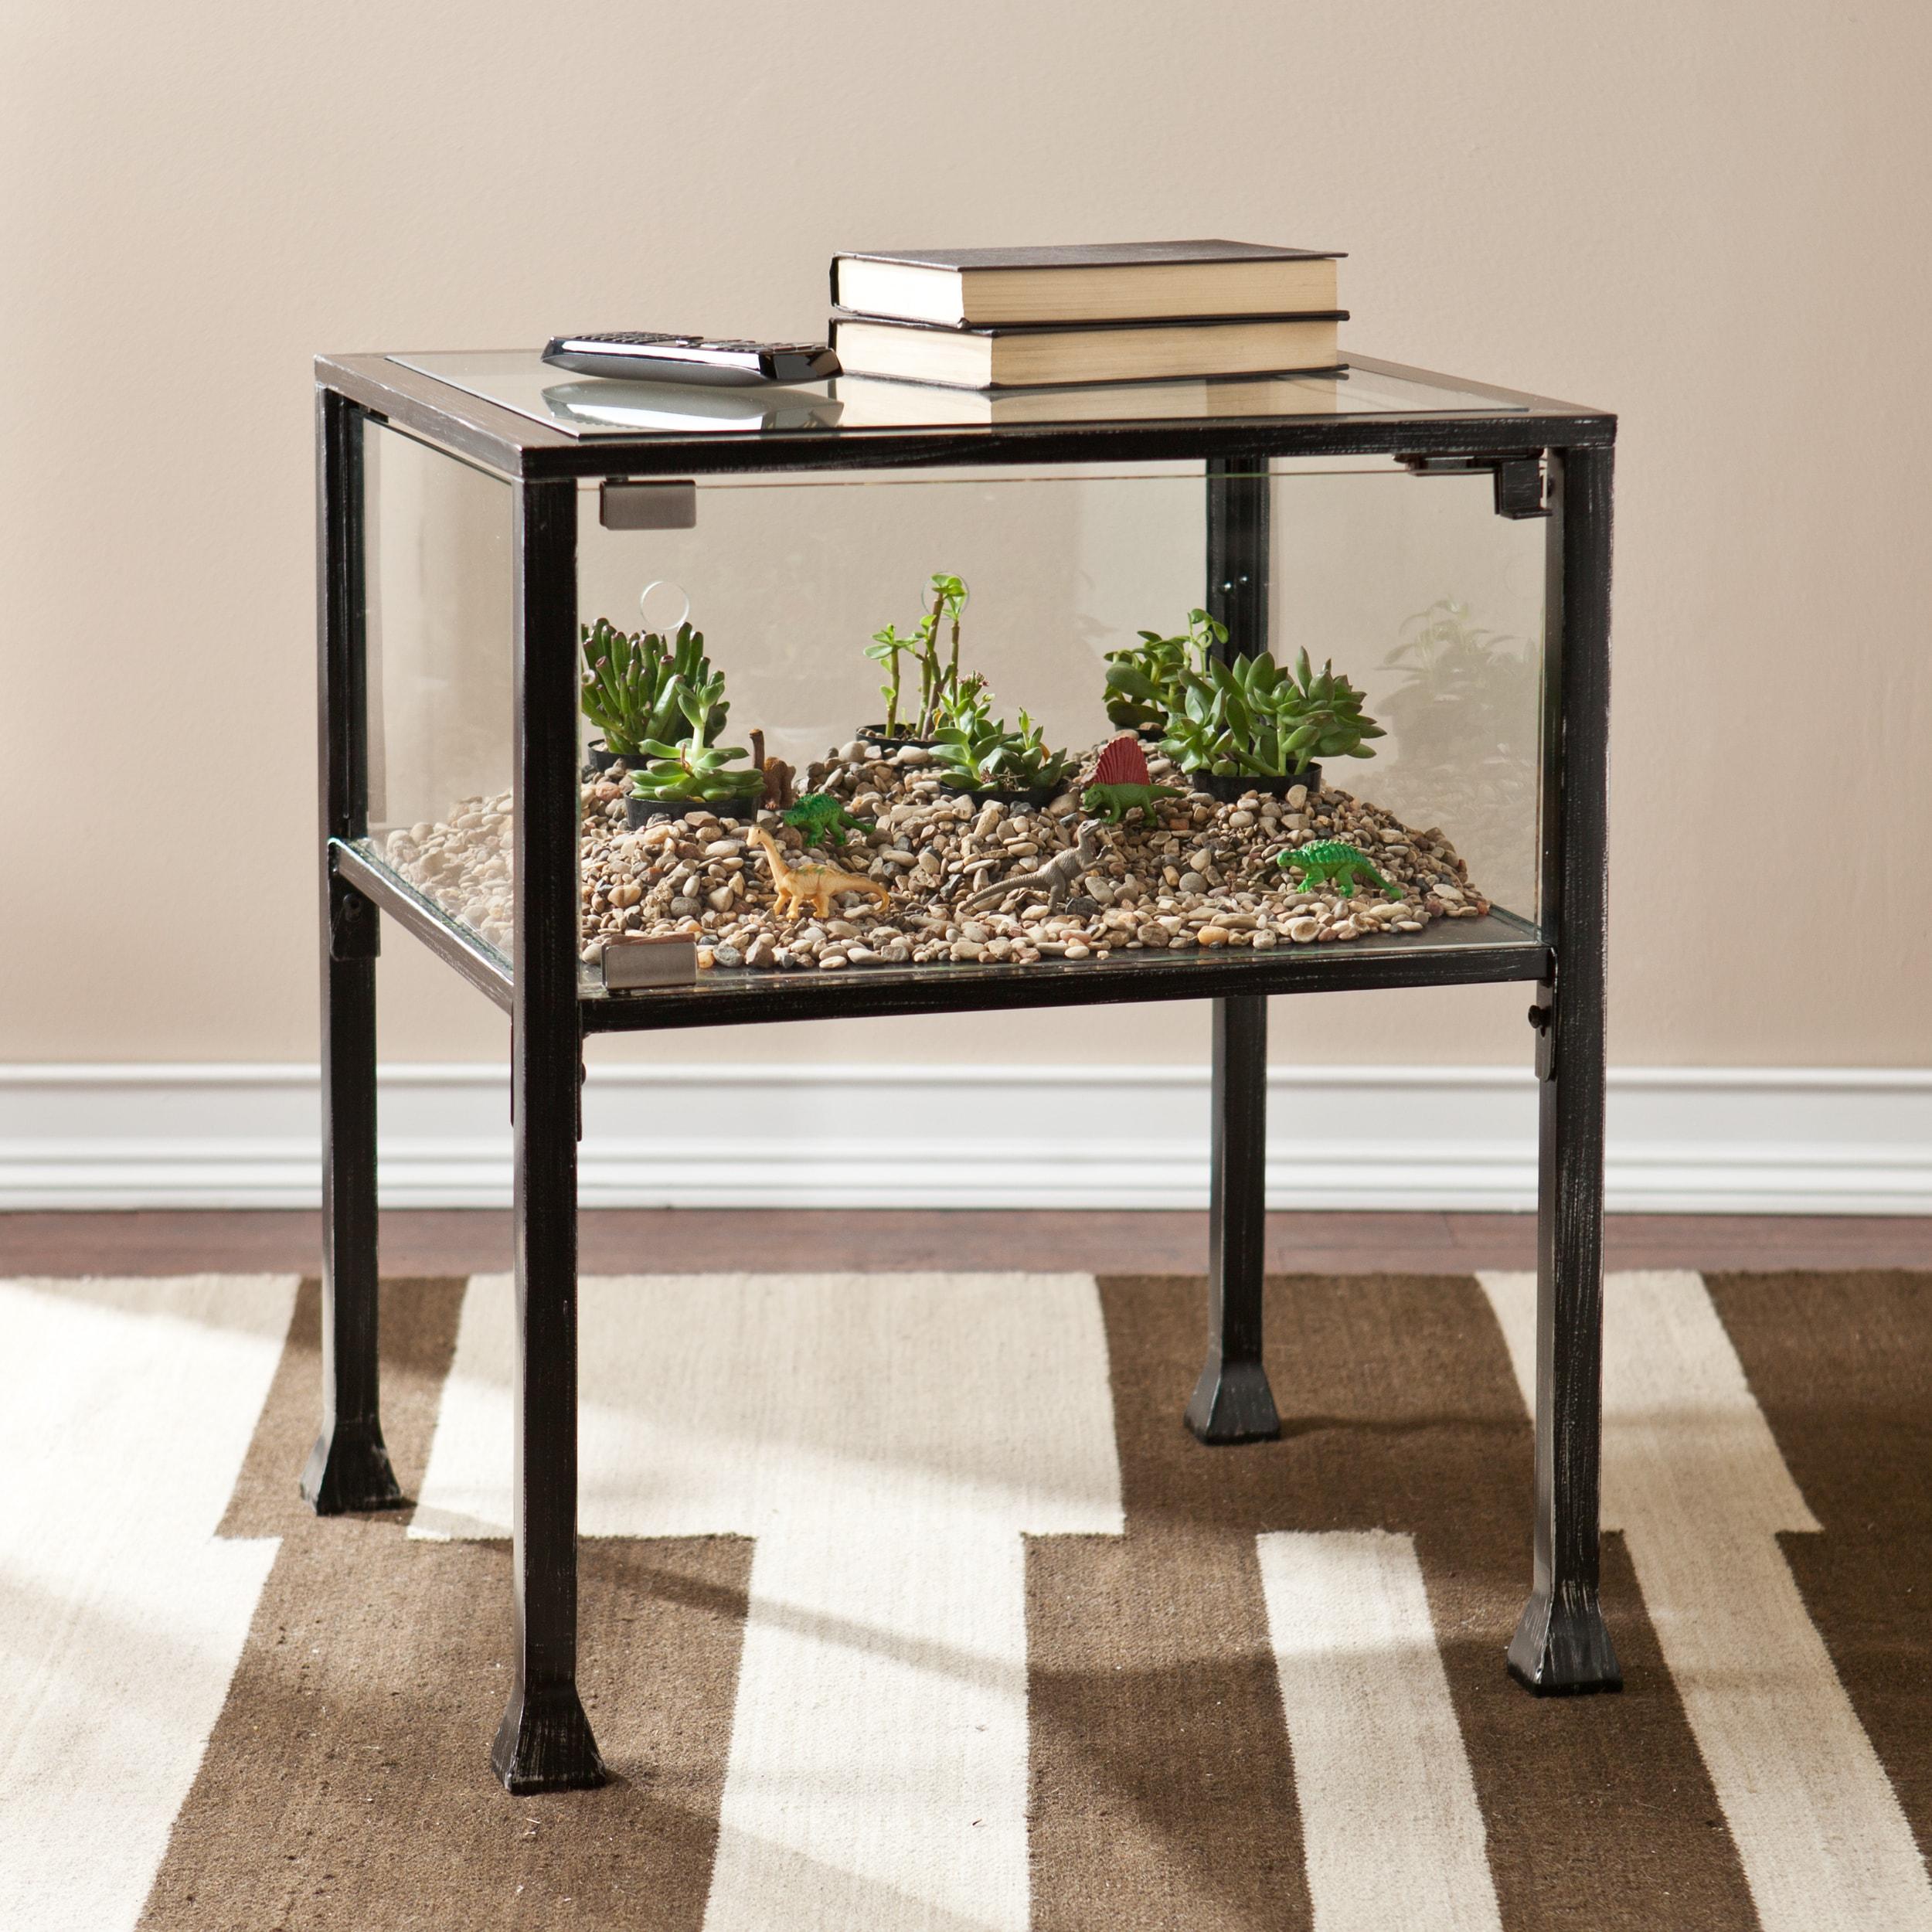 Carbon Loft Glenn Display Terrarium Side End Table Overstock 22751166 [ 2500 x 2500 Pixel ]